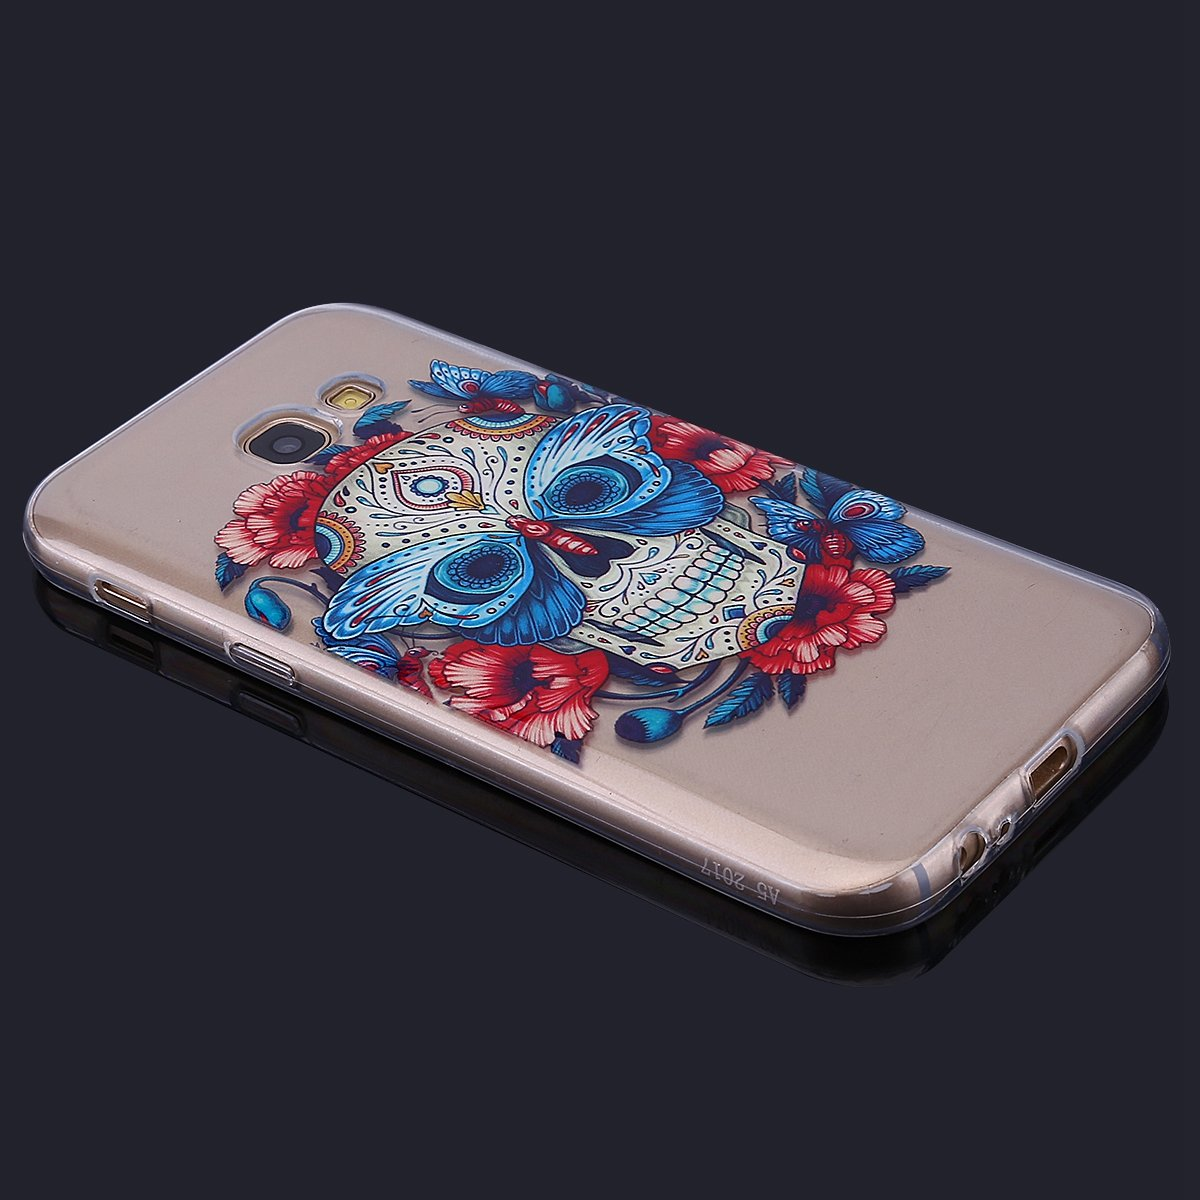 Étui Galaxy A5 2017 Surakey Samsung Galaxy A5 2017 Coque Transparente Silicone Gel TPU Souple Housse Etui de Protection Bumper avec Absorption de Choc et Anti-Scratch avec dessin Beau Plume fleur papillon Attrape-rêves Motif Etui de Coque Galaxy A5 2017